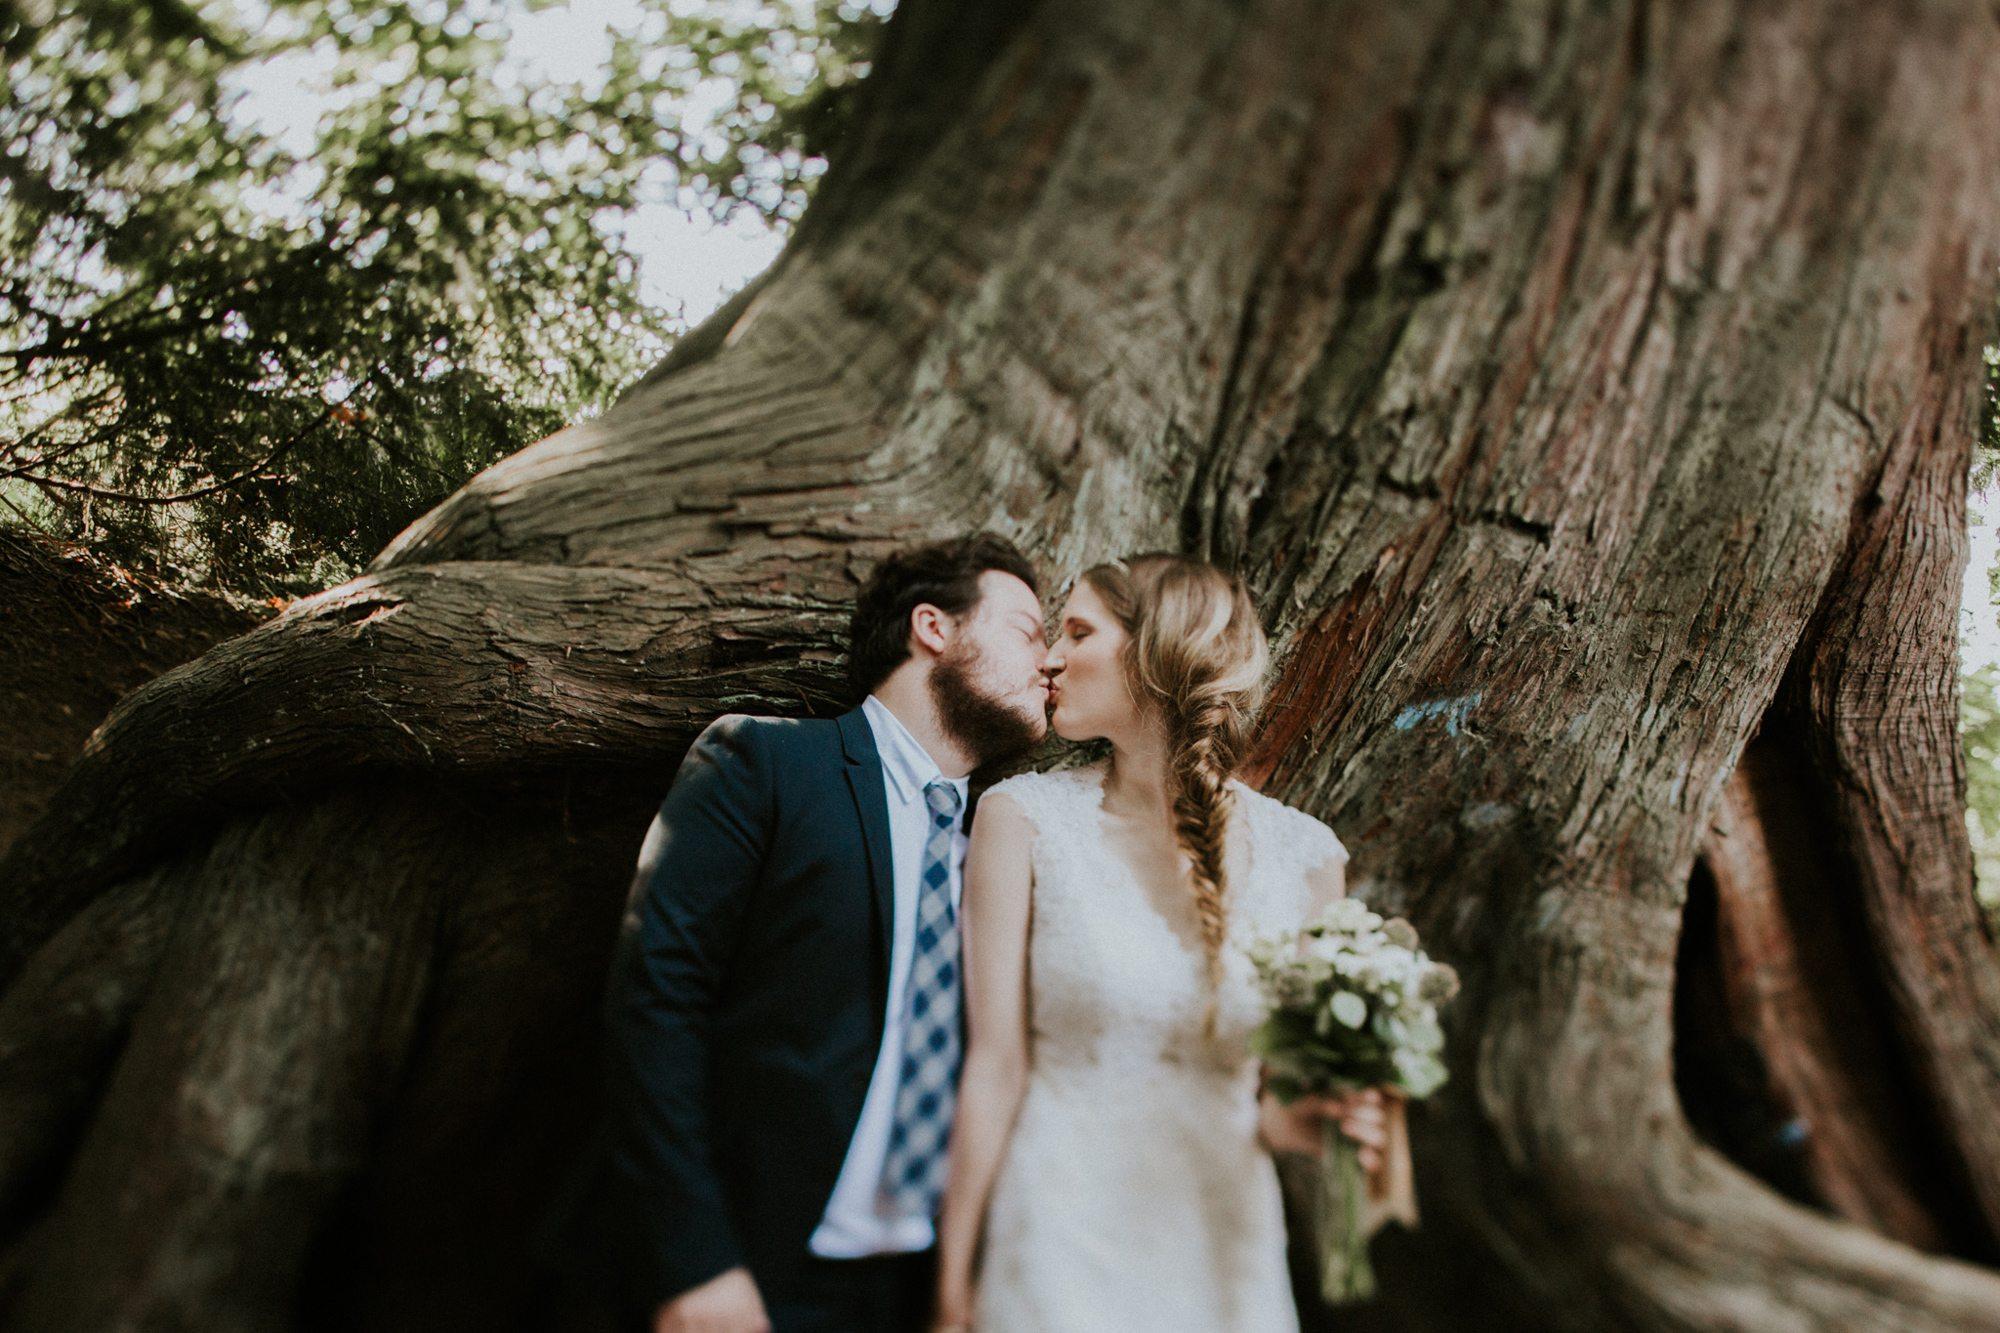 864-abbotsford-wedding-photographer